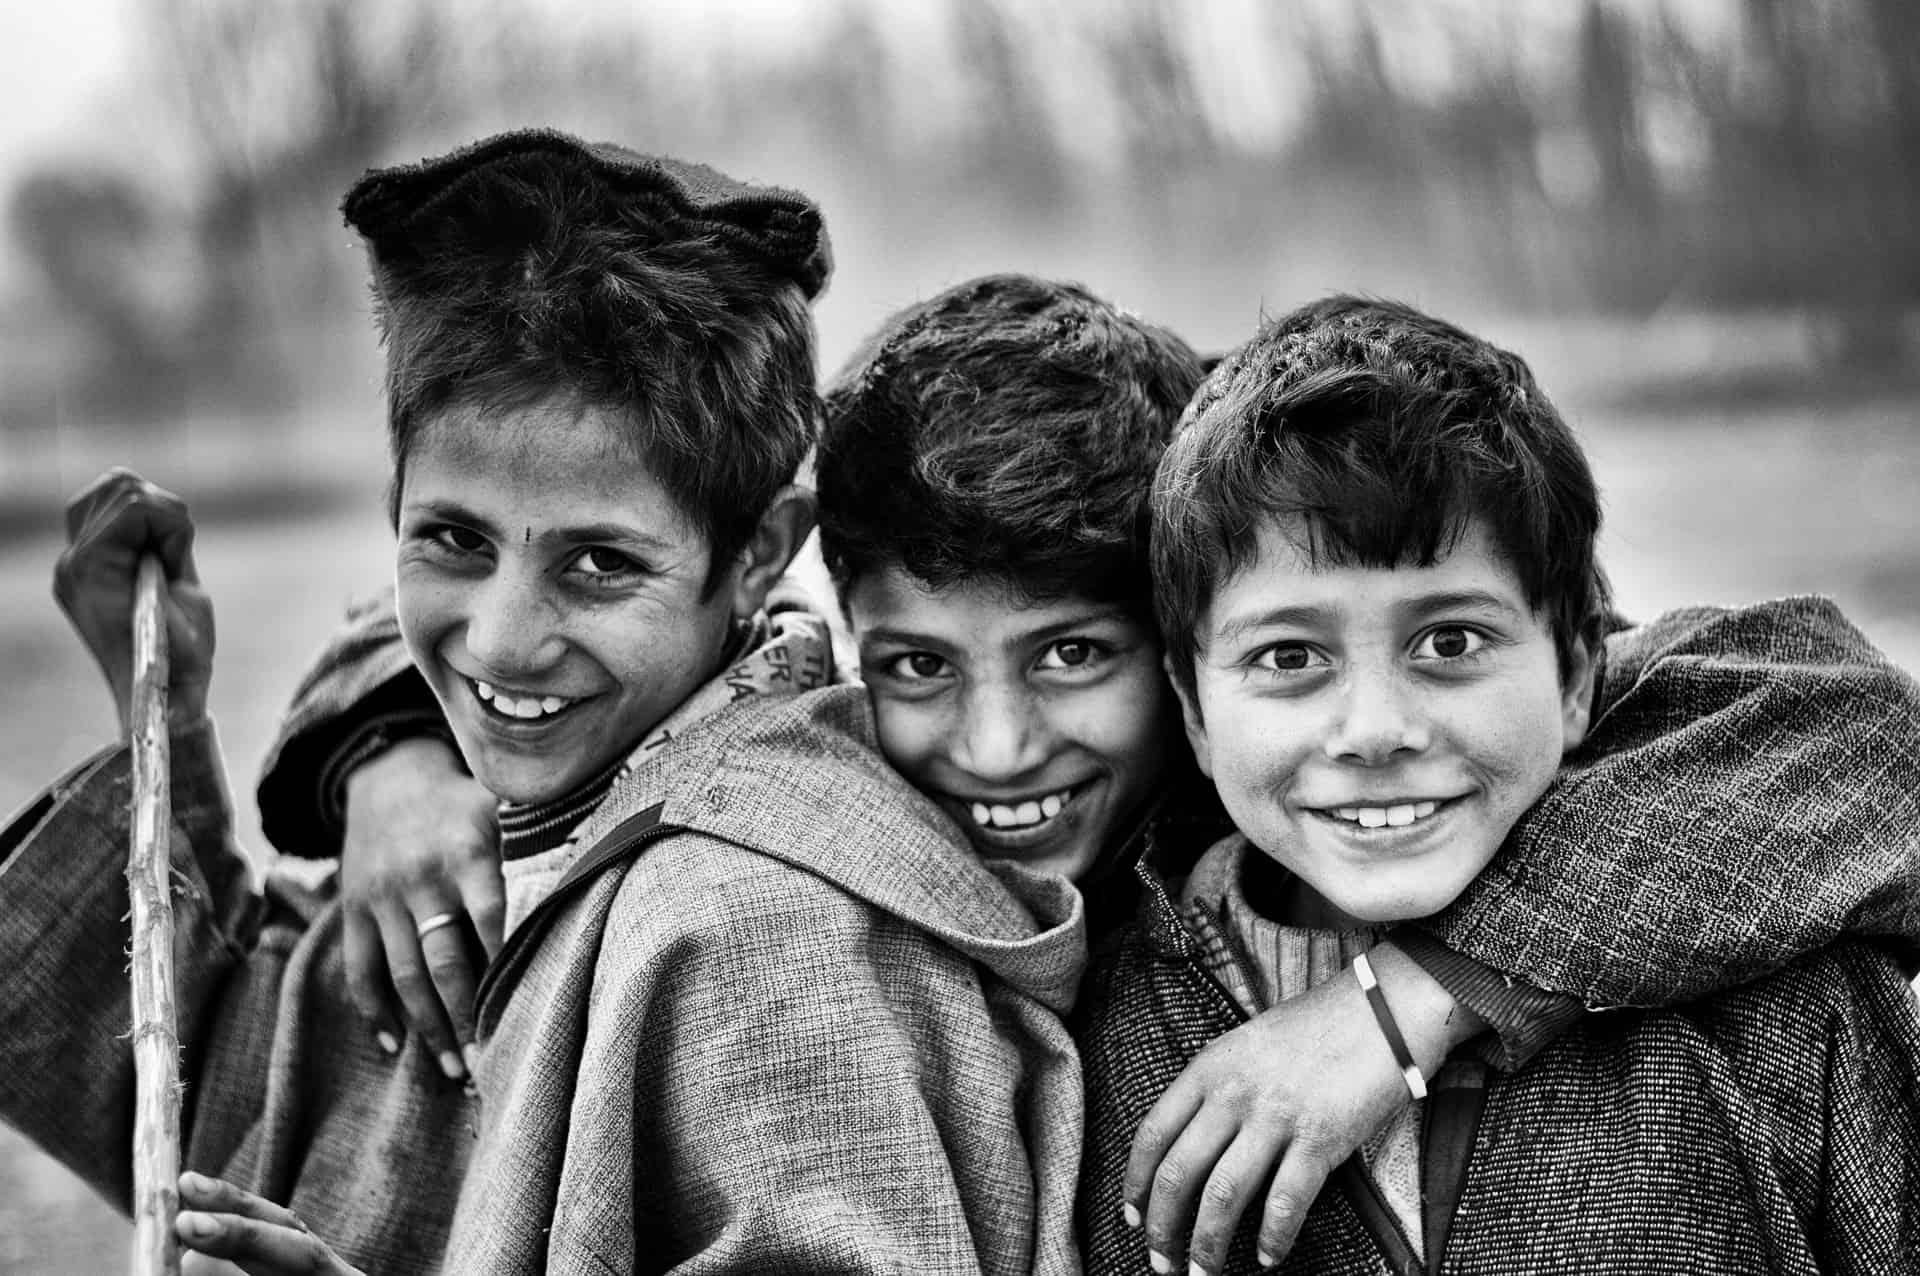 Brotherhood, friendship and wilayah